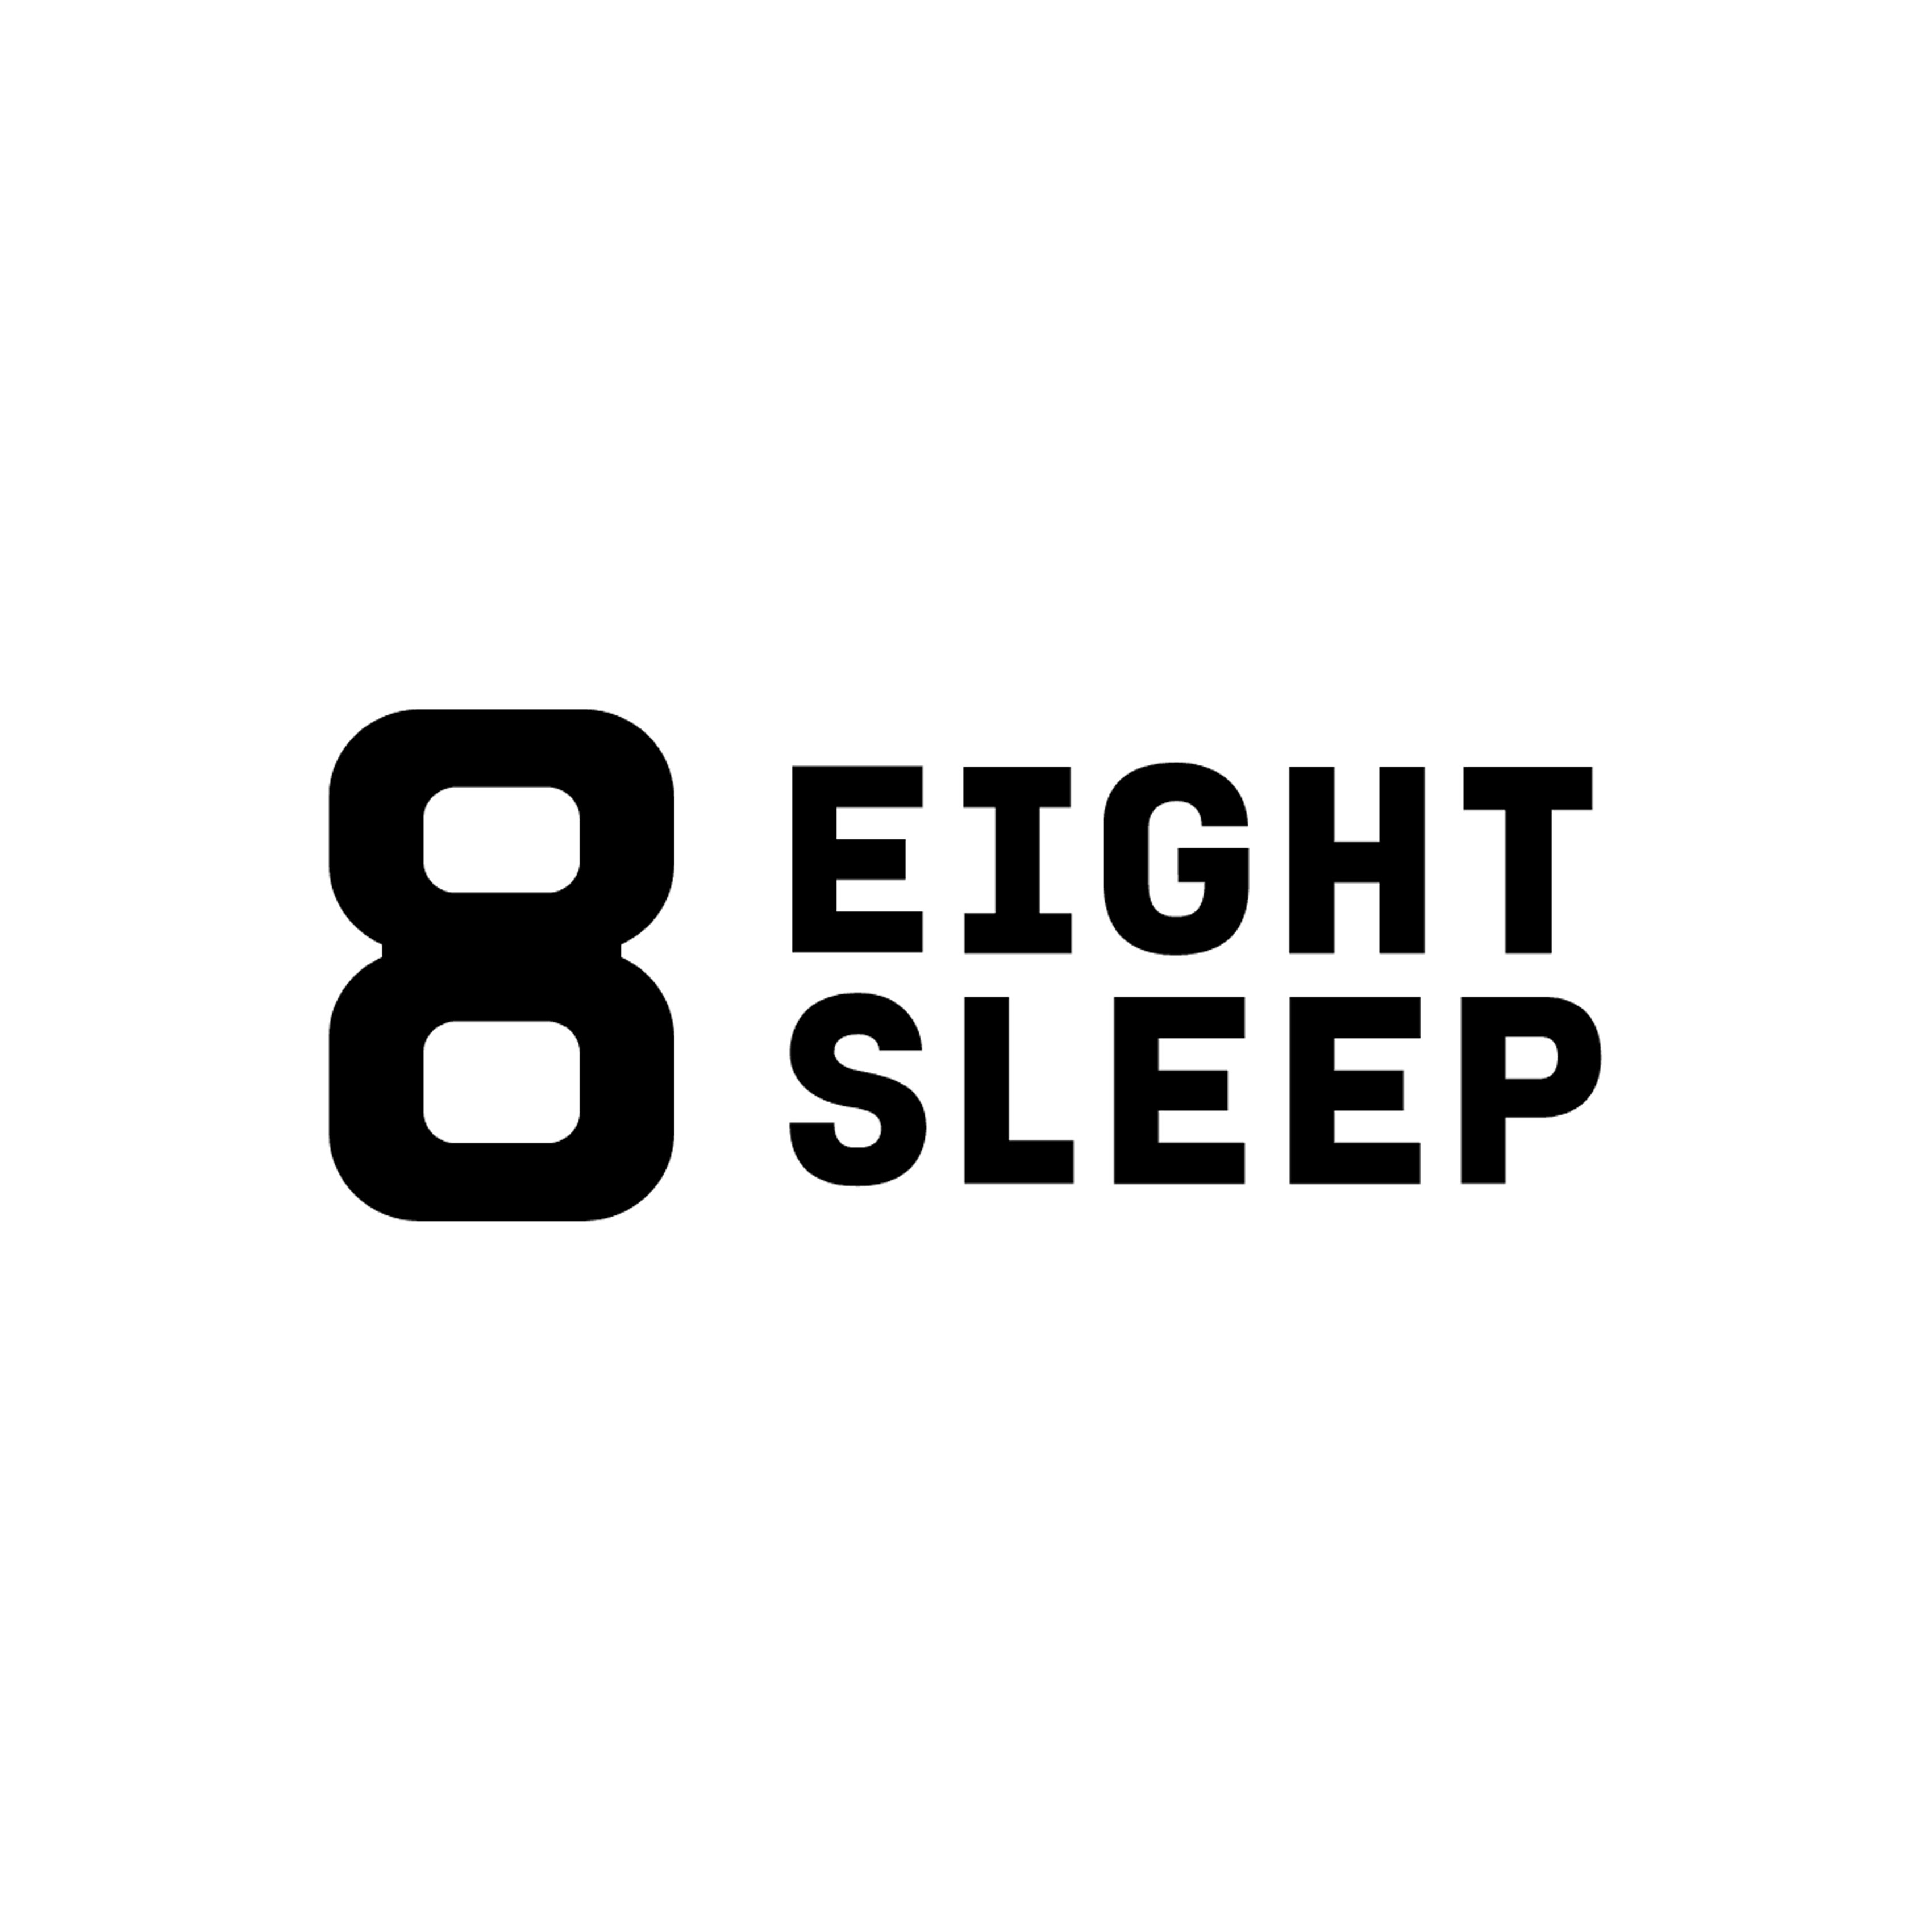 eightsleep logo